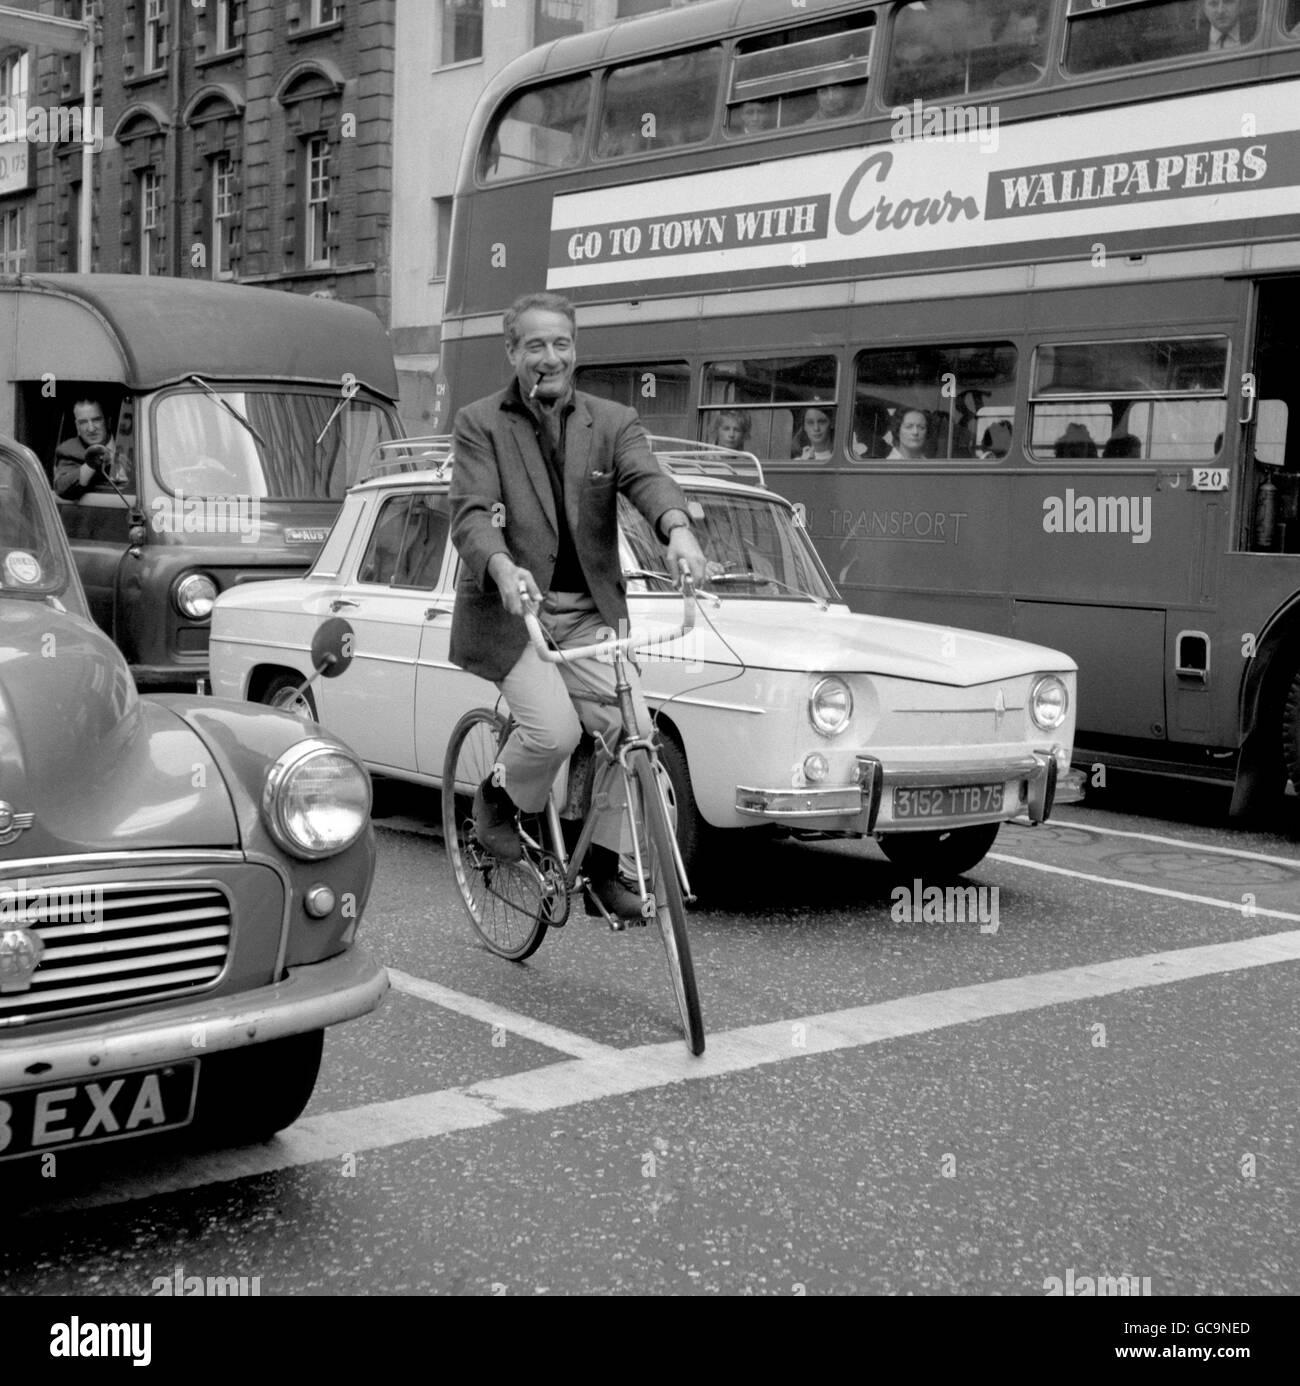 Me & My Bike - London - 1964 - Stock Image